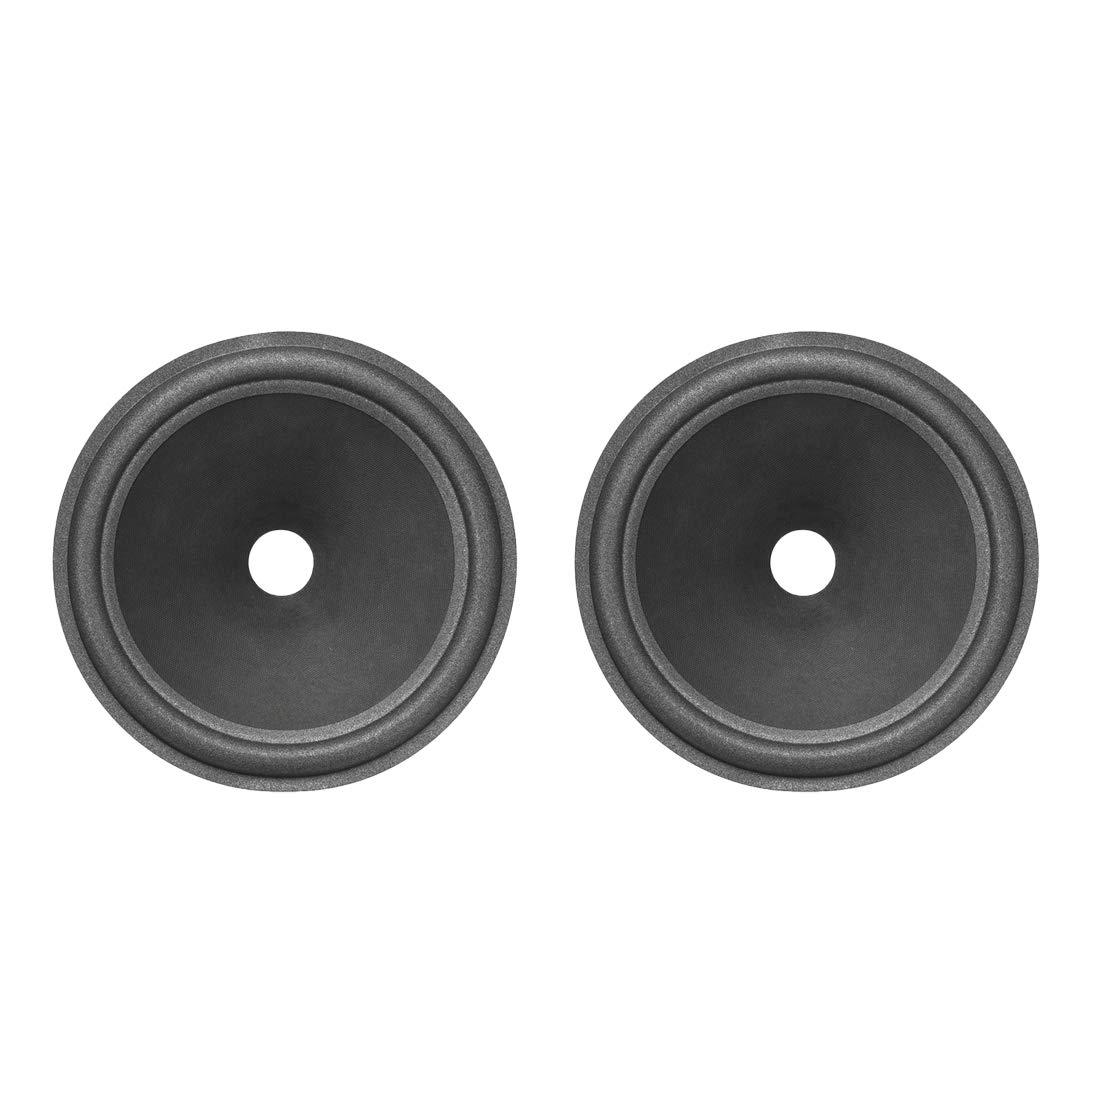 uxcell 10'' Paper Speaker Cone Subwoofer Drum Dot Paper 1.4'' Coil Diameter with Foam Surround Dark Grey 2 Pcs